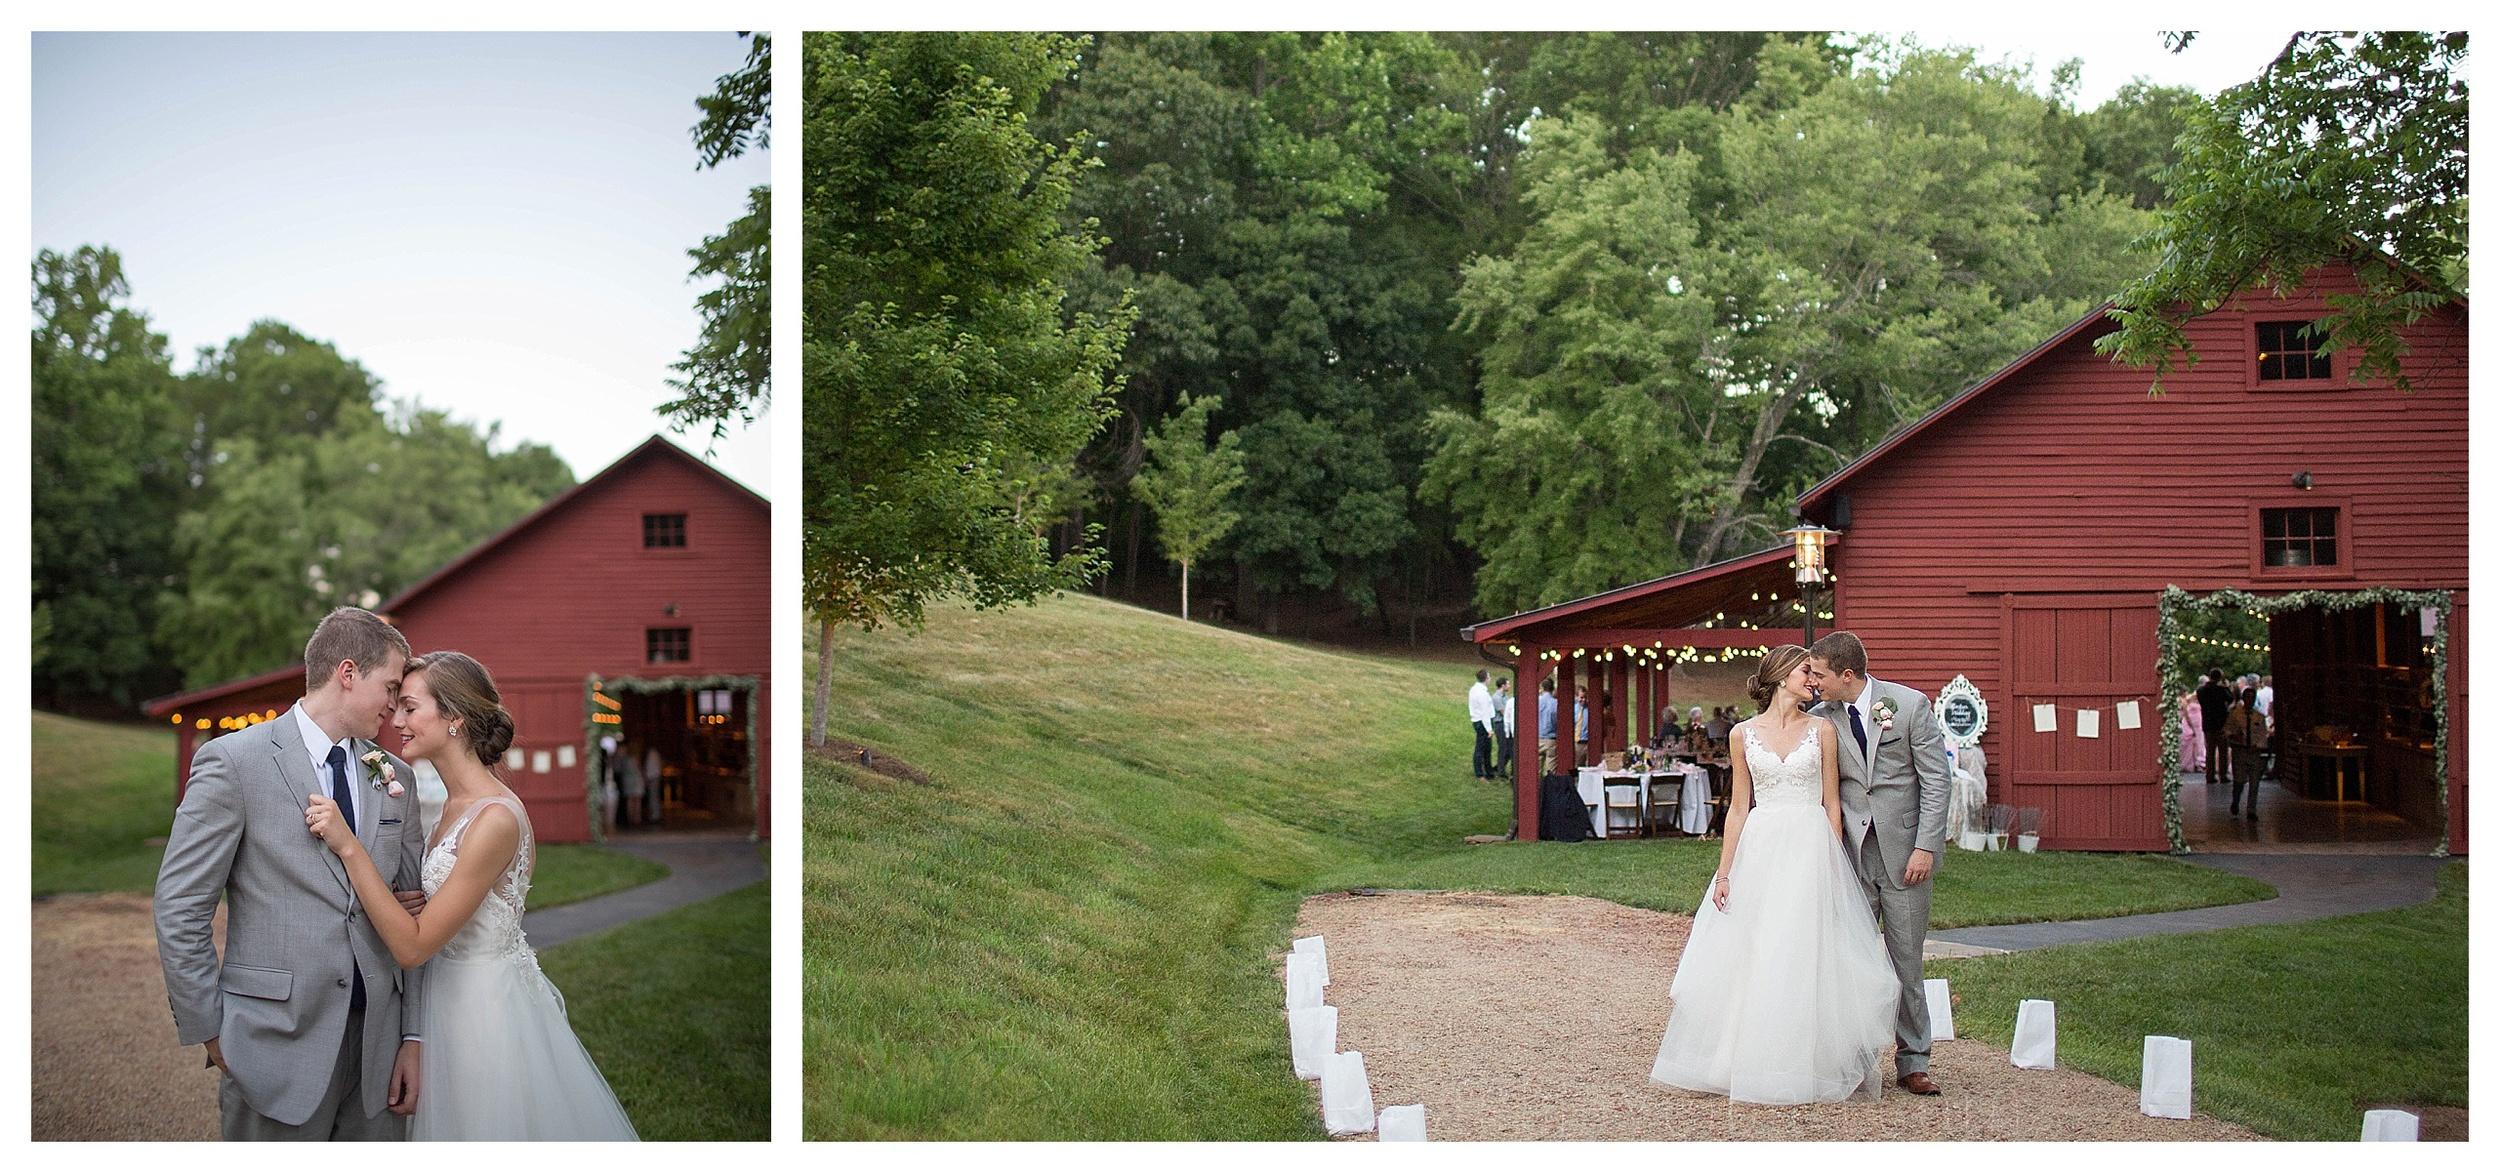 Greensboro, NC Wedding Photographer   Wedding Photographer at Steele Crest   Ashley Eiban Photography   www.ashleyeiban.com